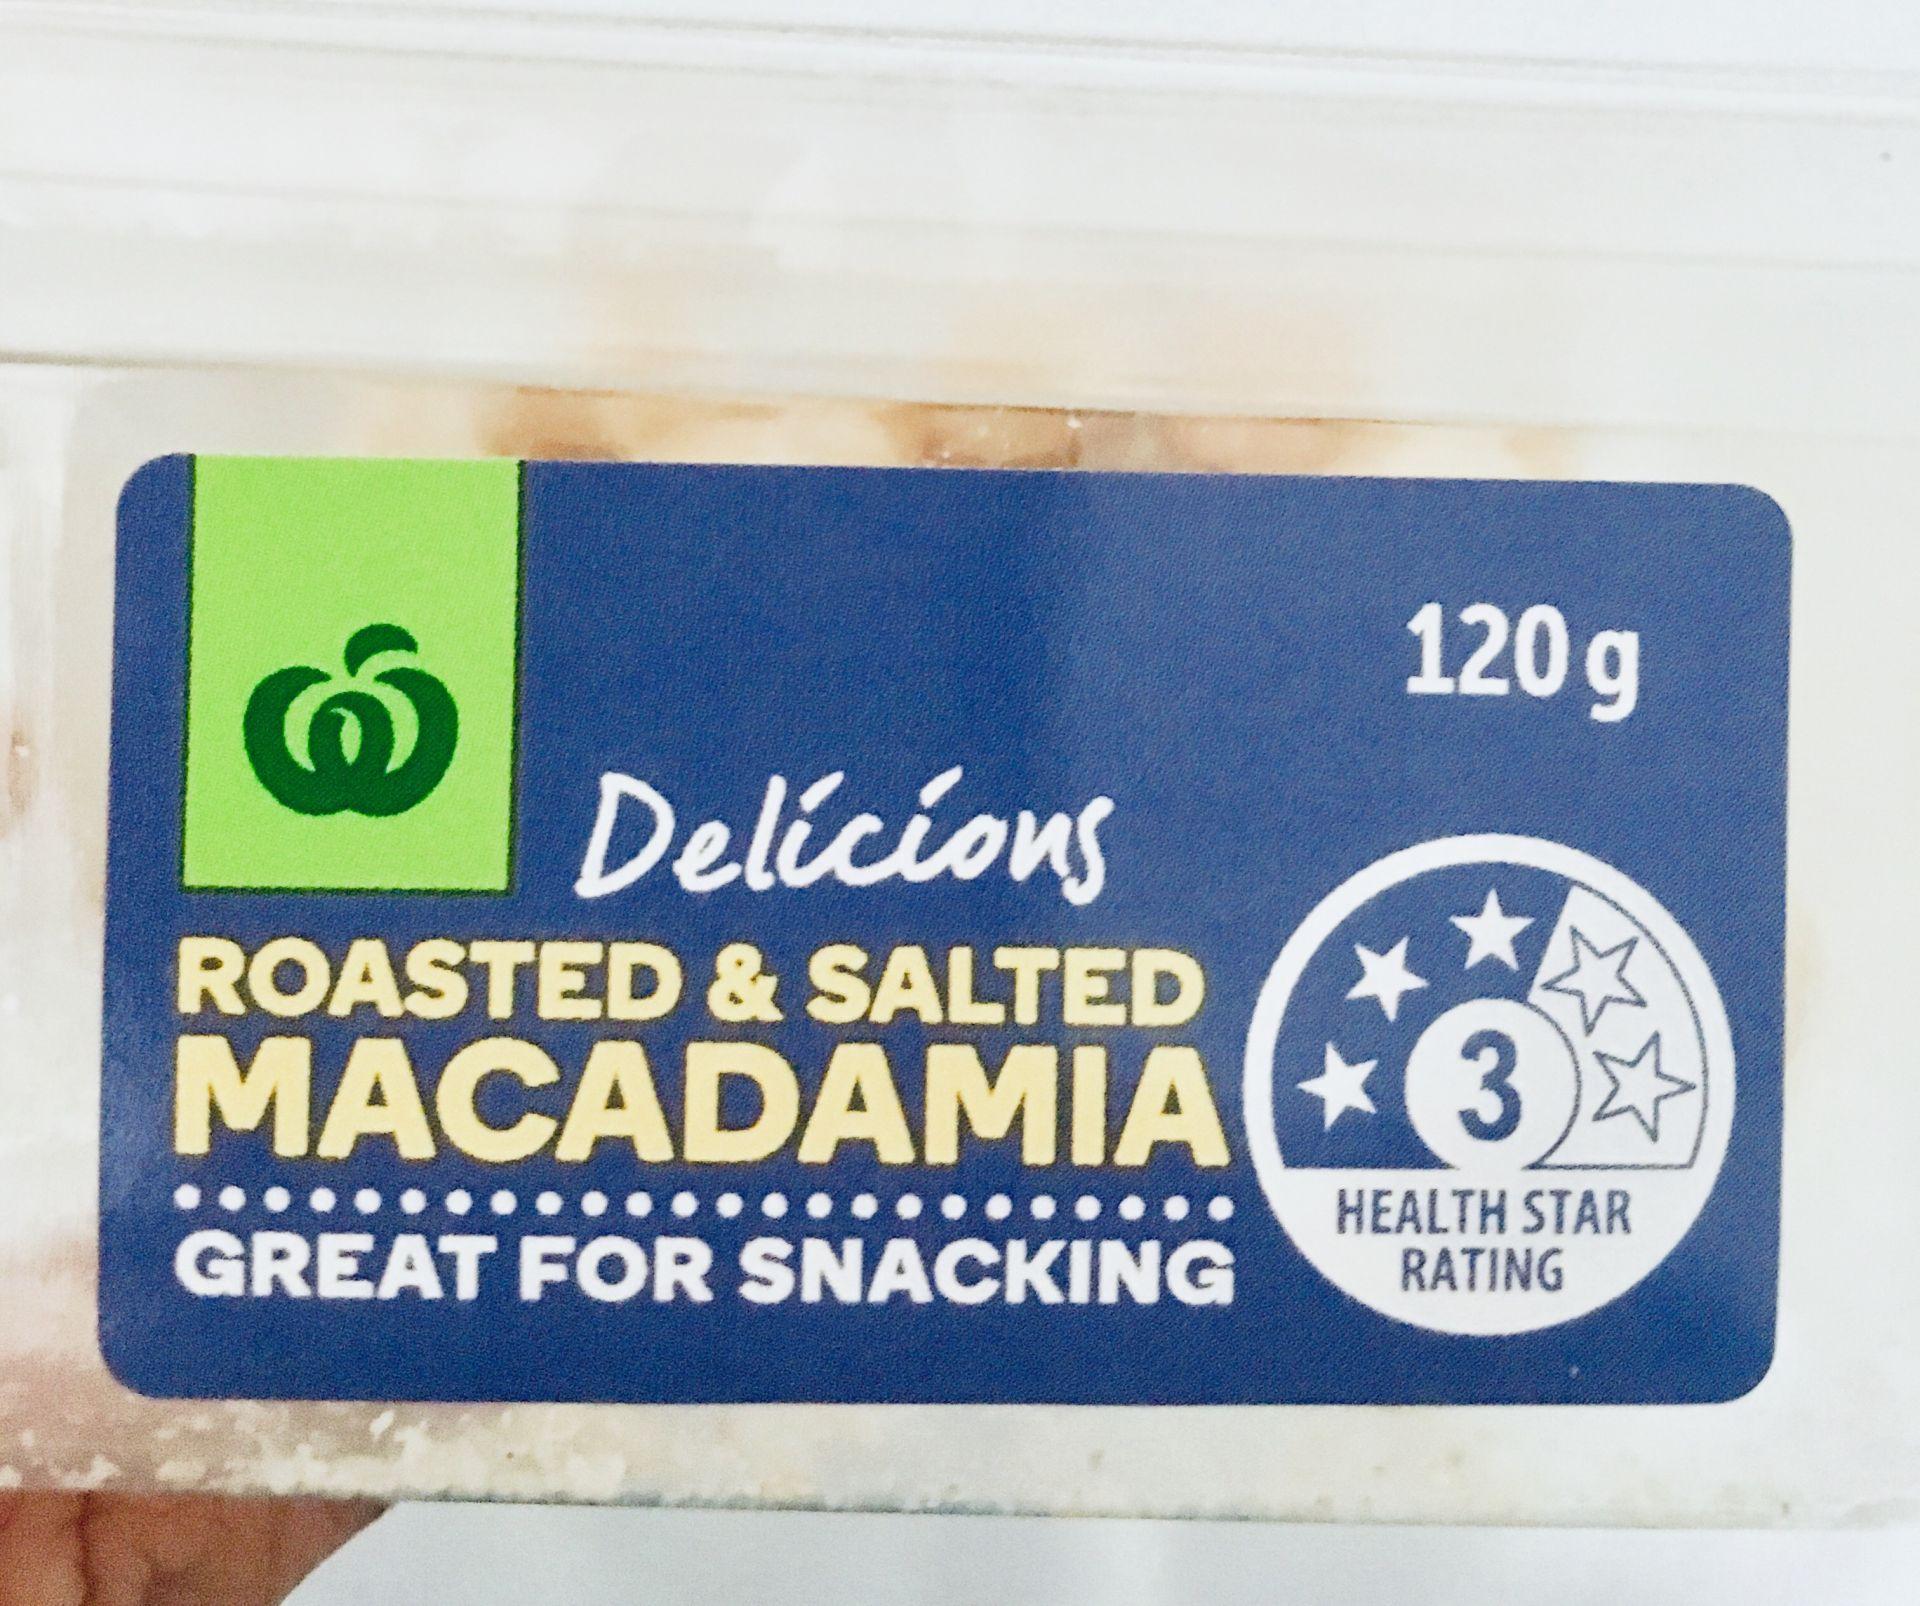 health rating